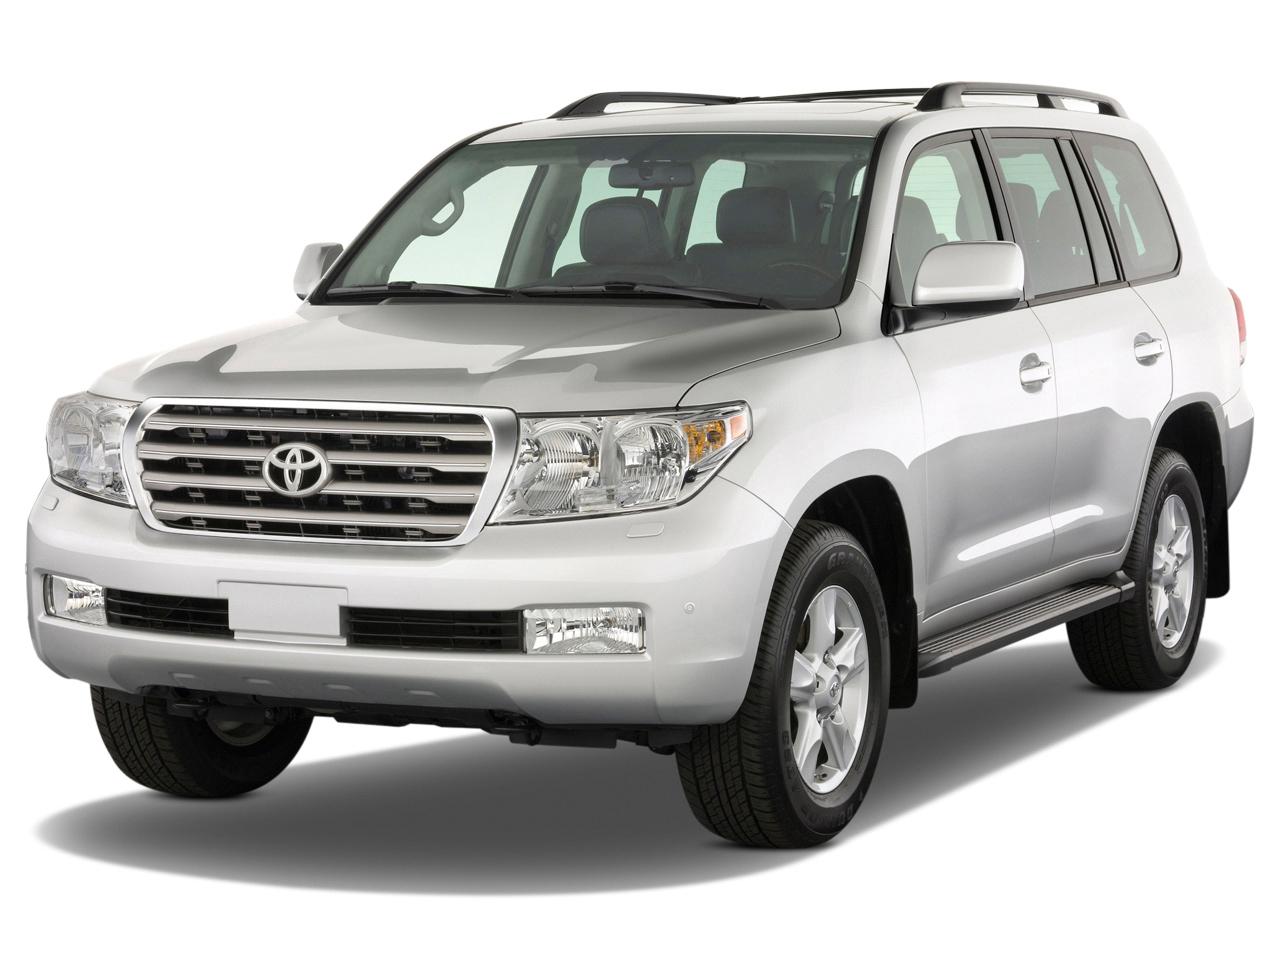 Kelebihan Toyota Land Cruiser 2011 Perbandingan Harga